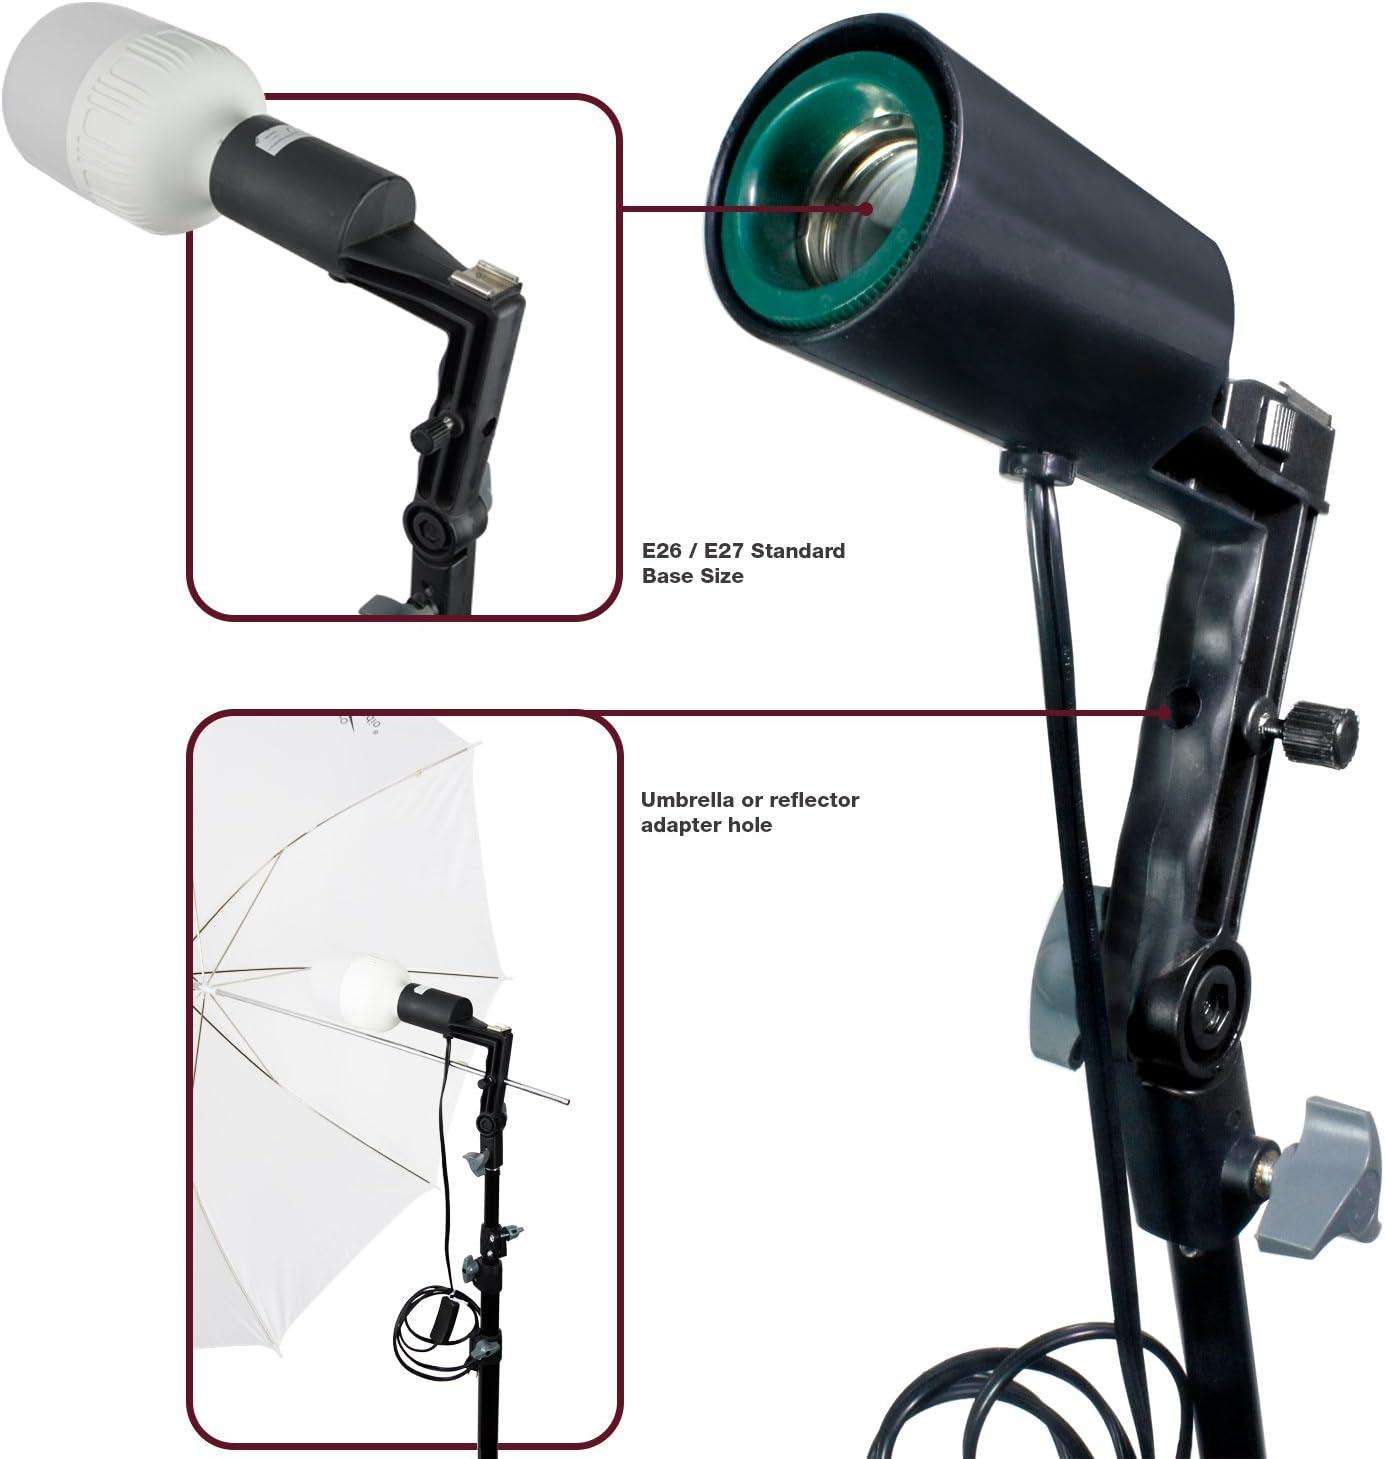 AGG2757 LimoStudio White Umbrella Reflector Lighting Kit Photography Photo Studio Umbrella /& LED Lighting Kit